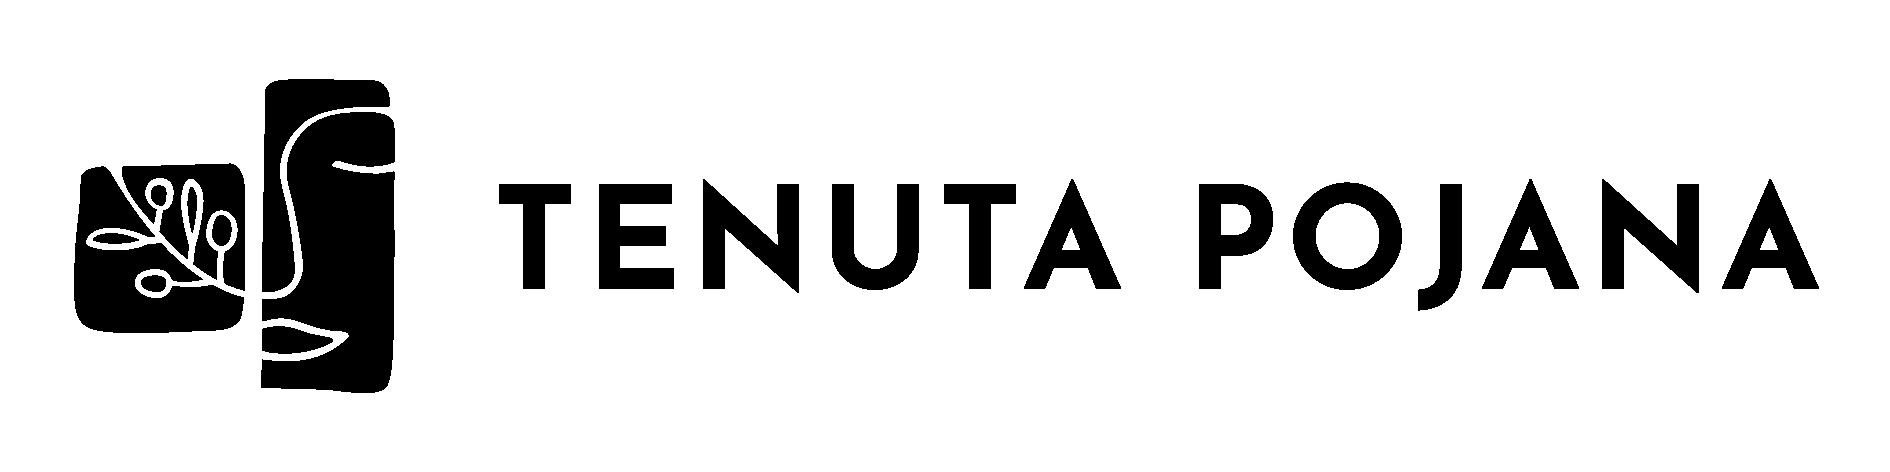 TENUTAPOJANA_MARCHIO+LOGO_ORIZZONTALE_2_A